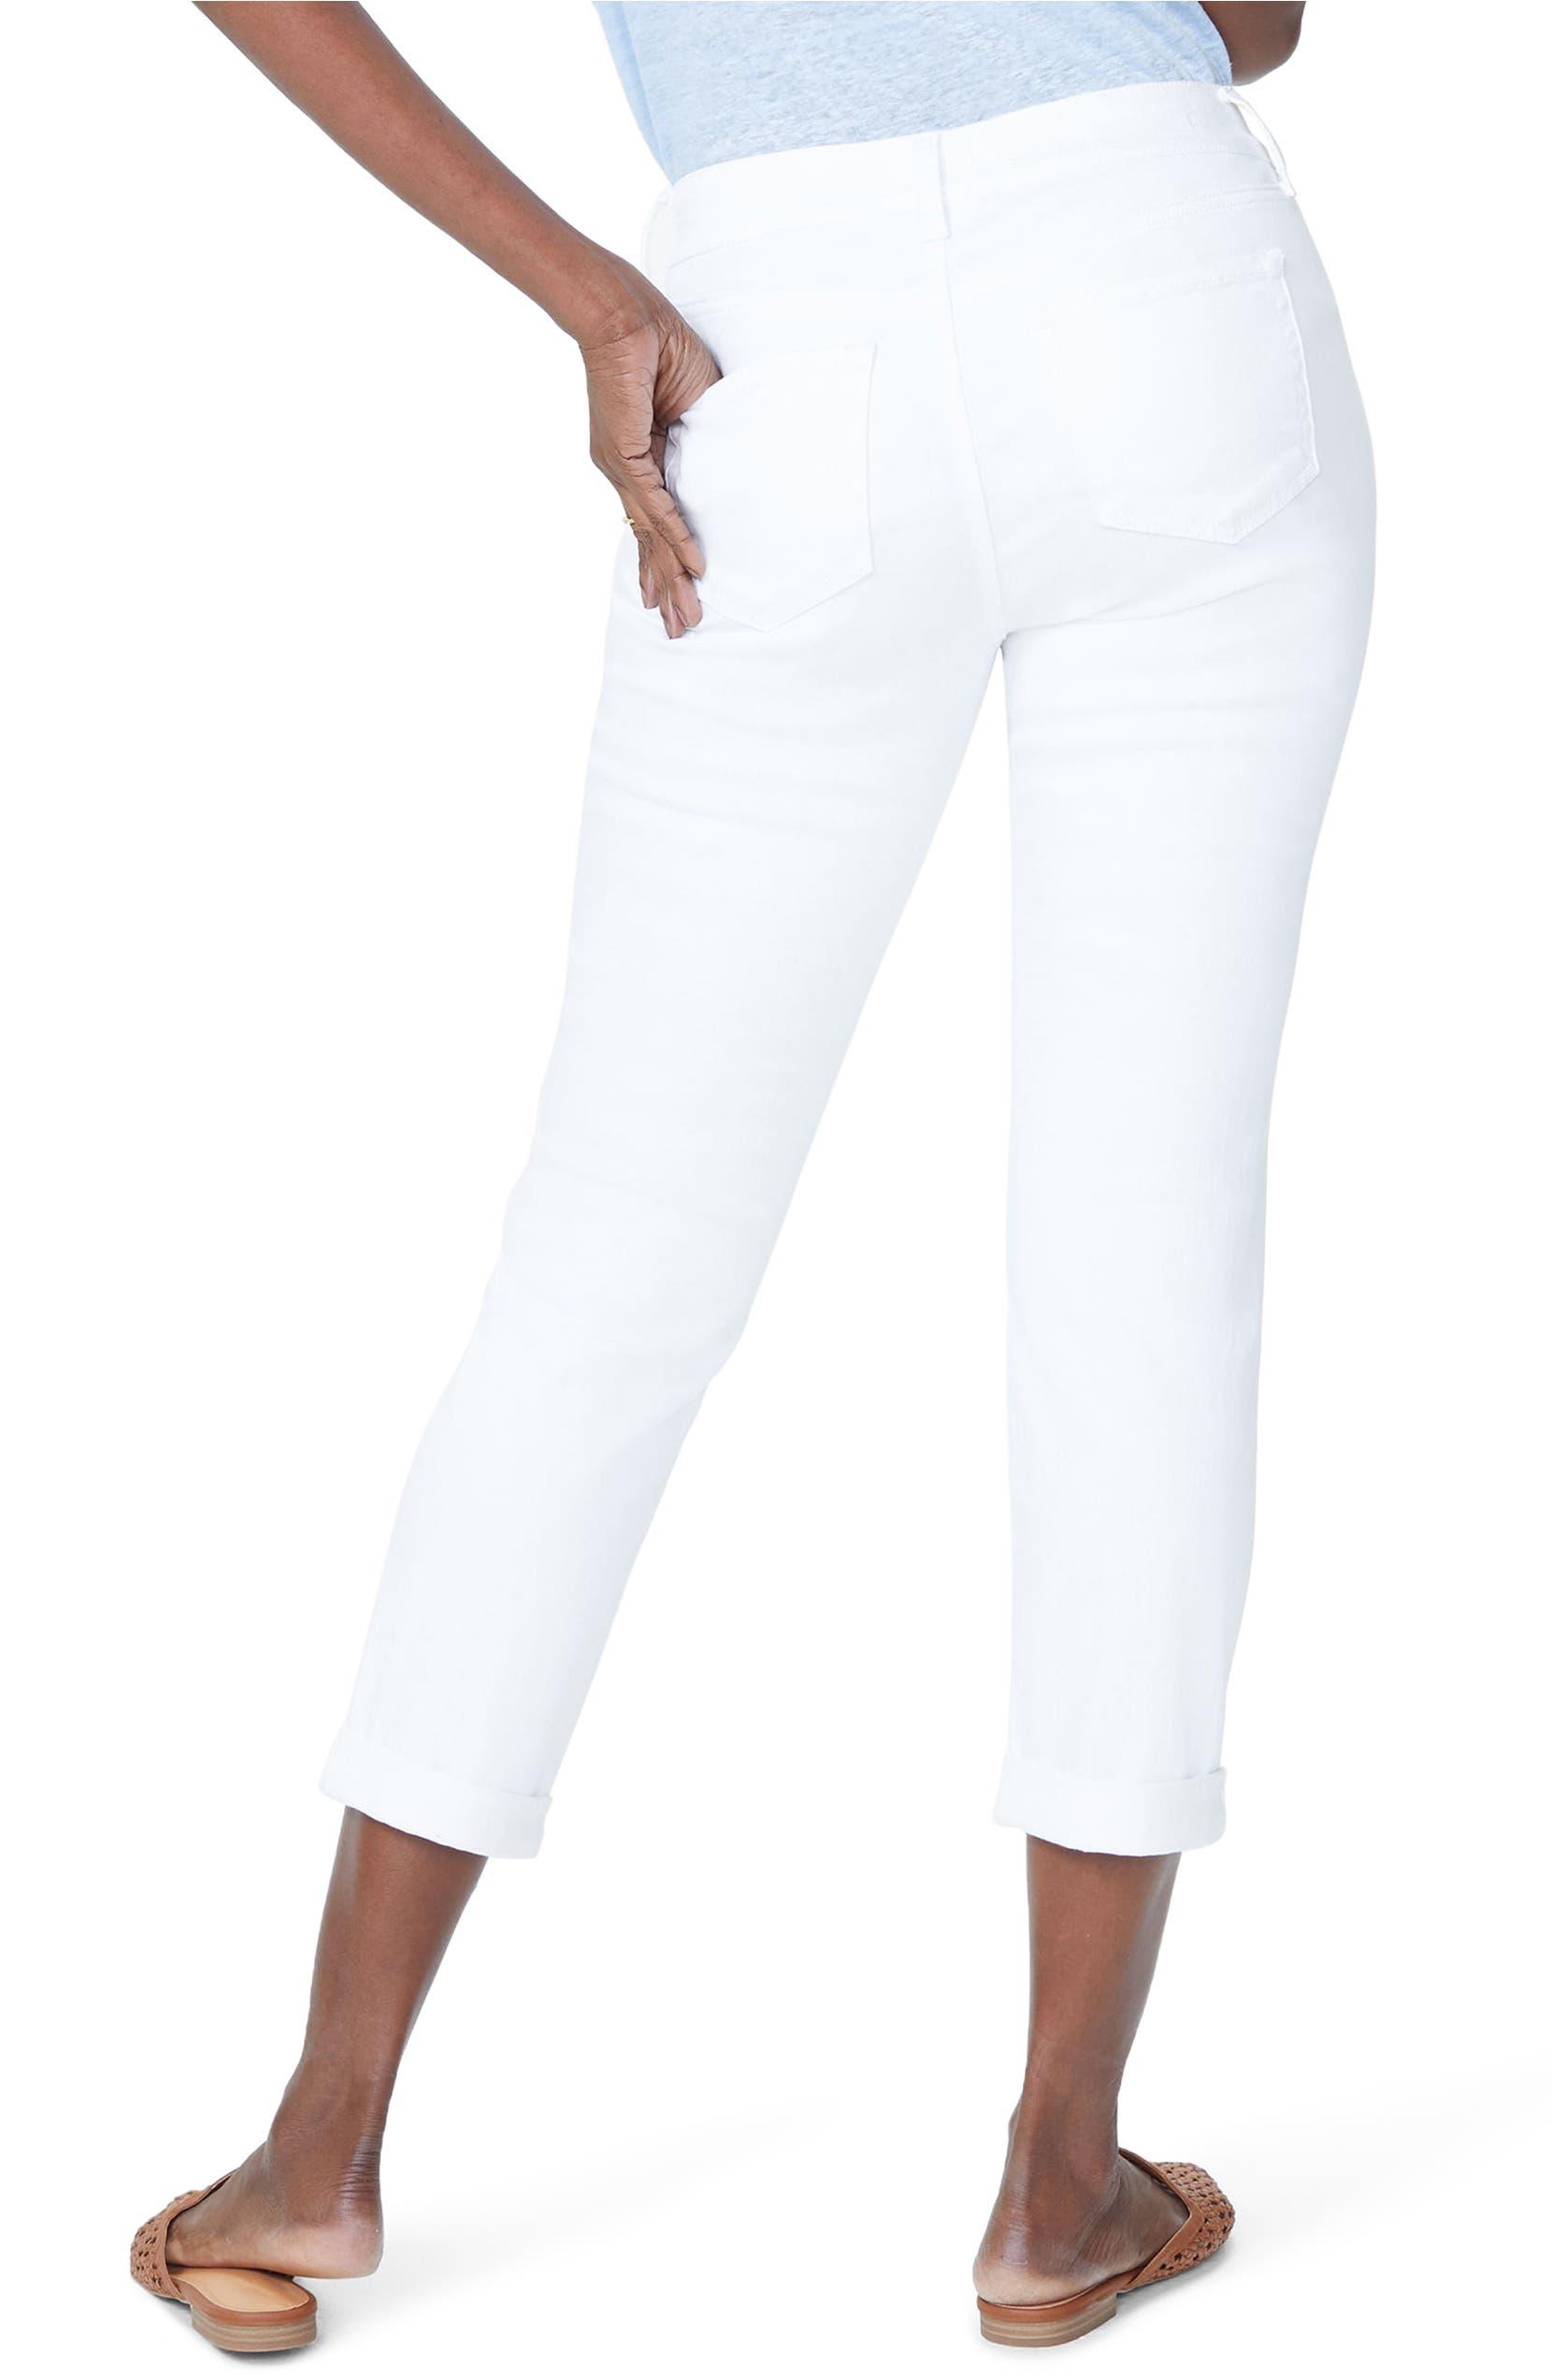 6bd4db00a74 NYDJ Puff Embroidery White Boyfriend Jeans